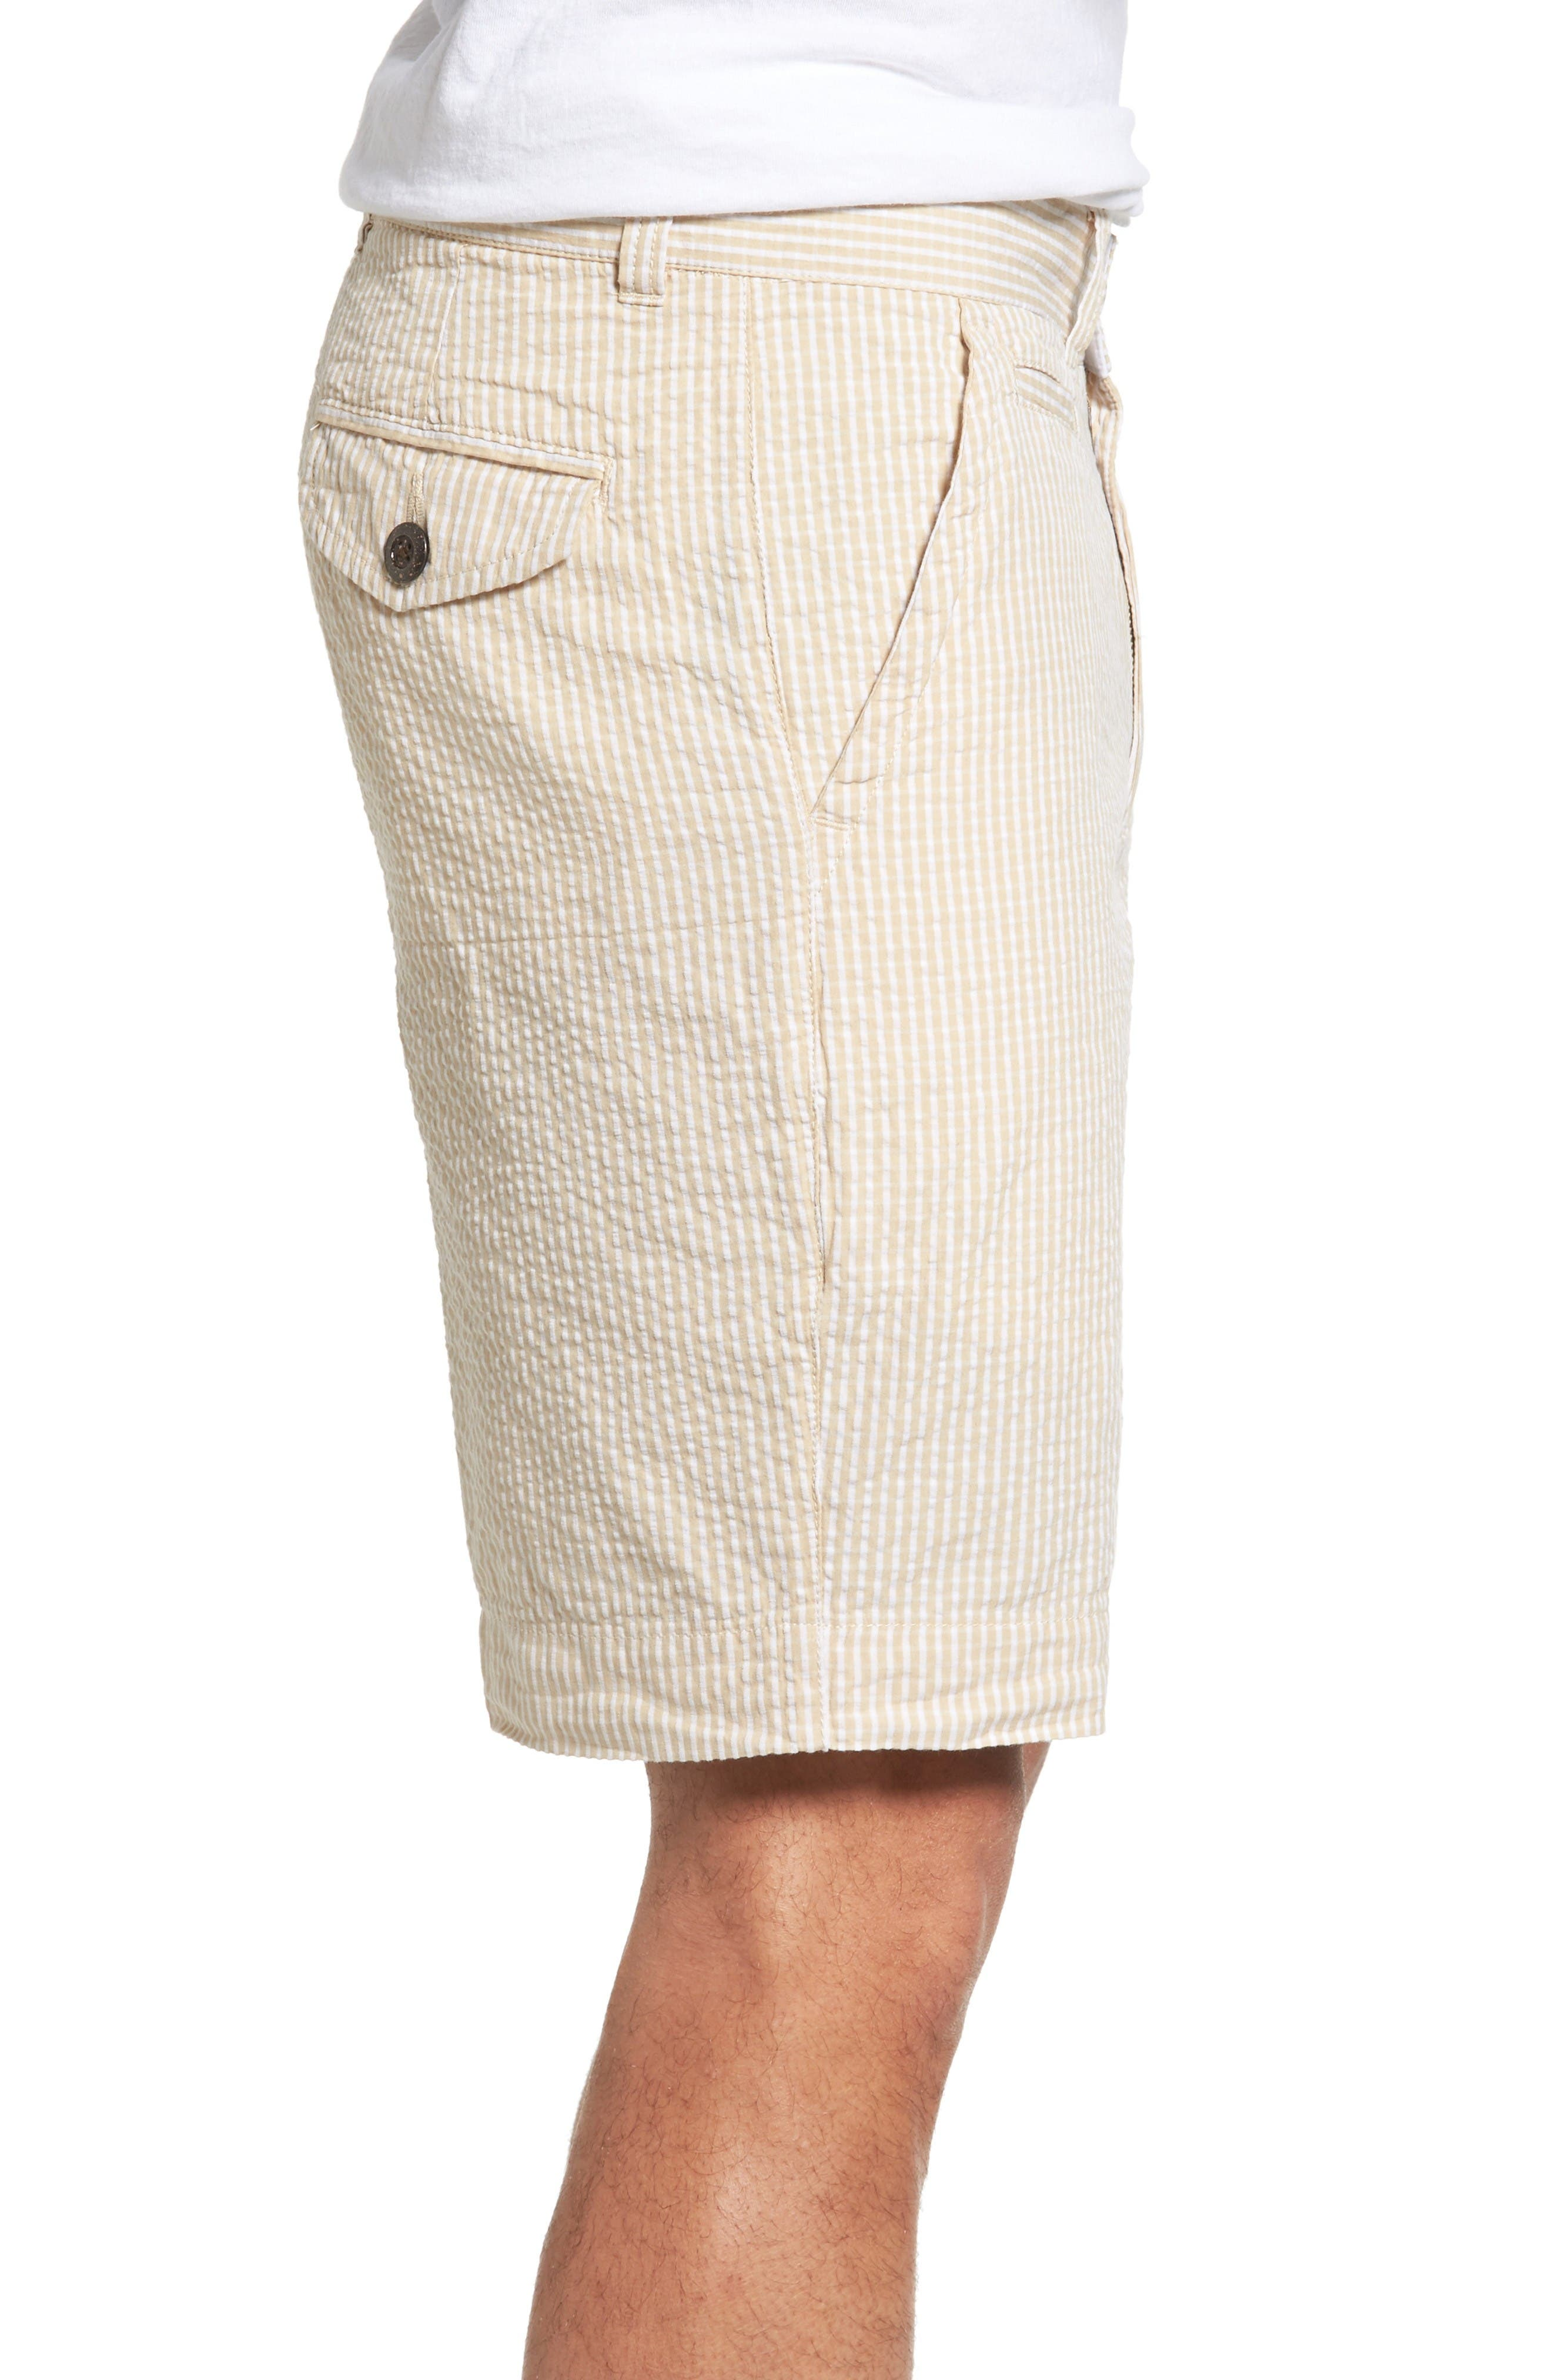 Stripe Seersucker Shorts,                             Alternate thumbnail 3, color,                             Tan